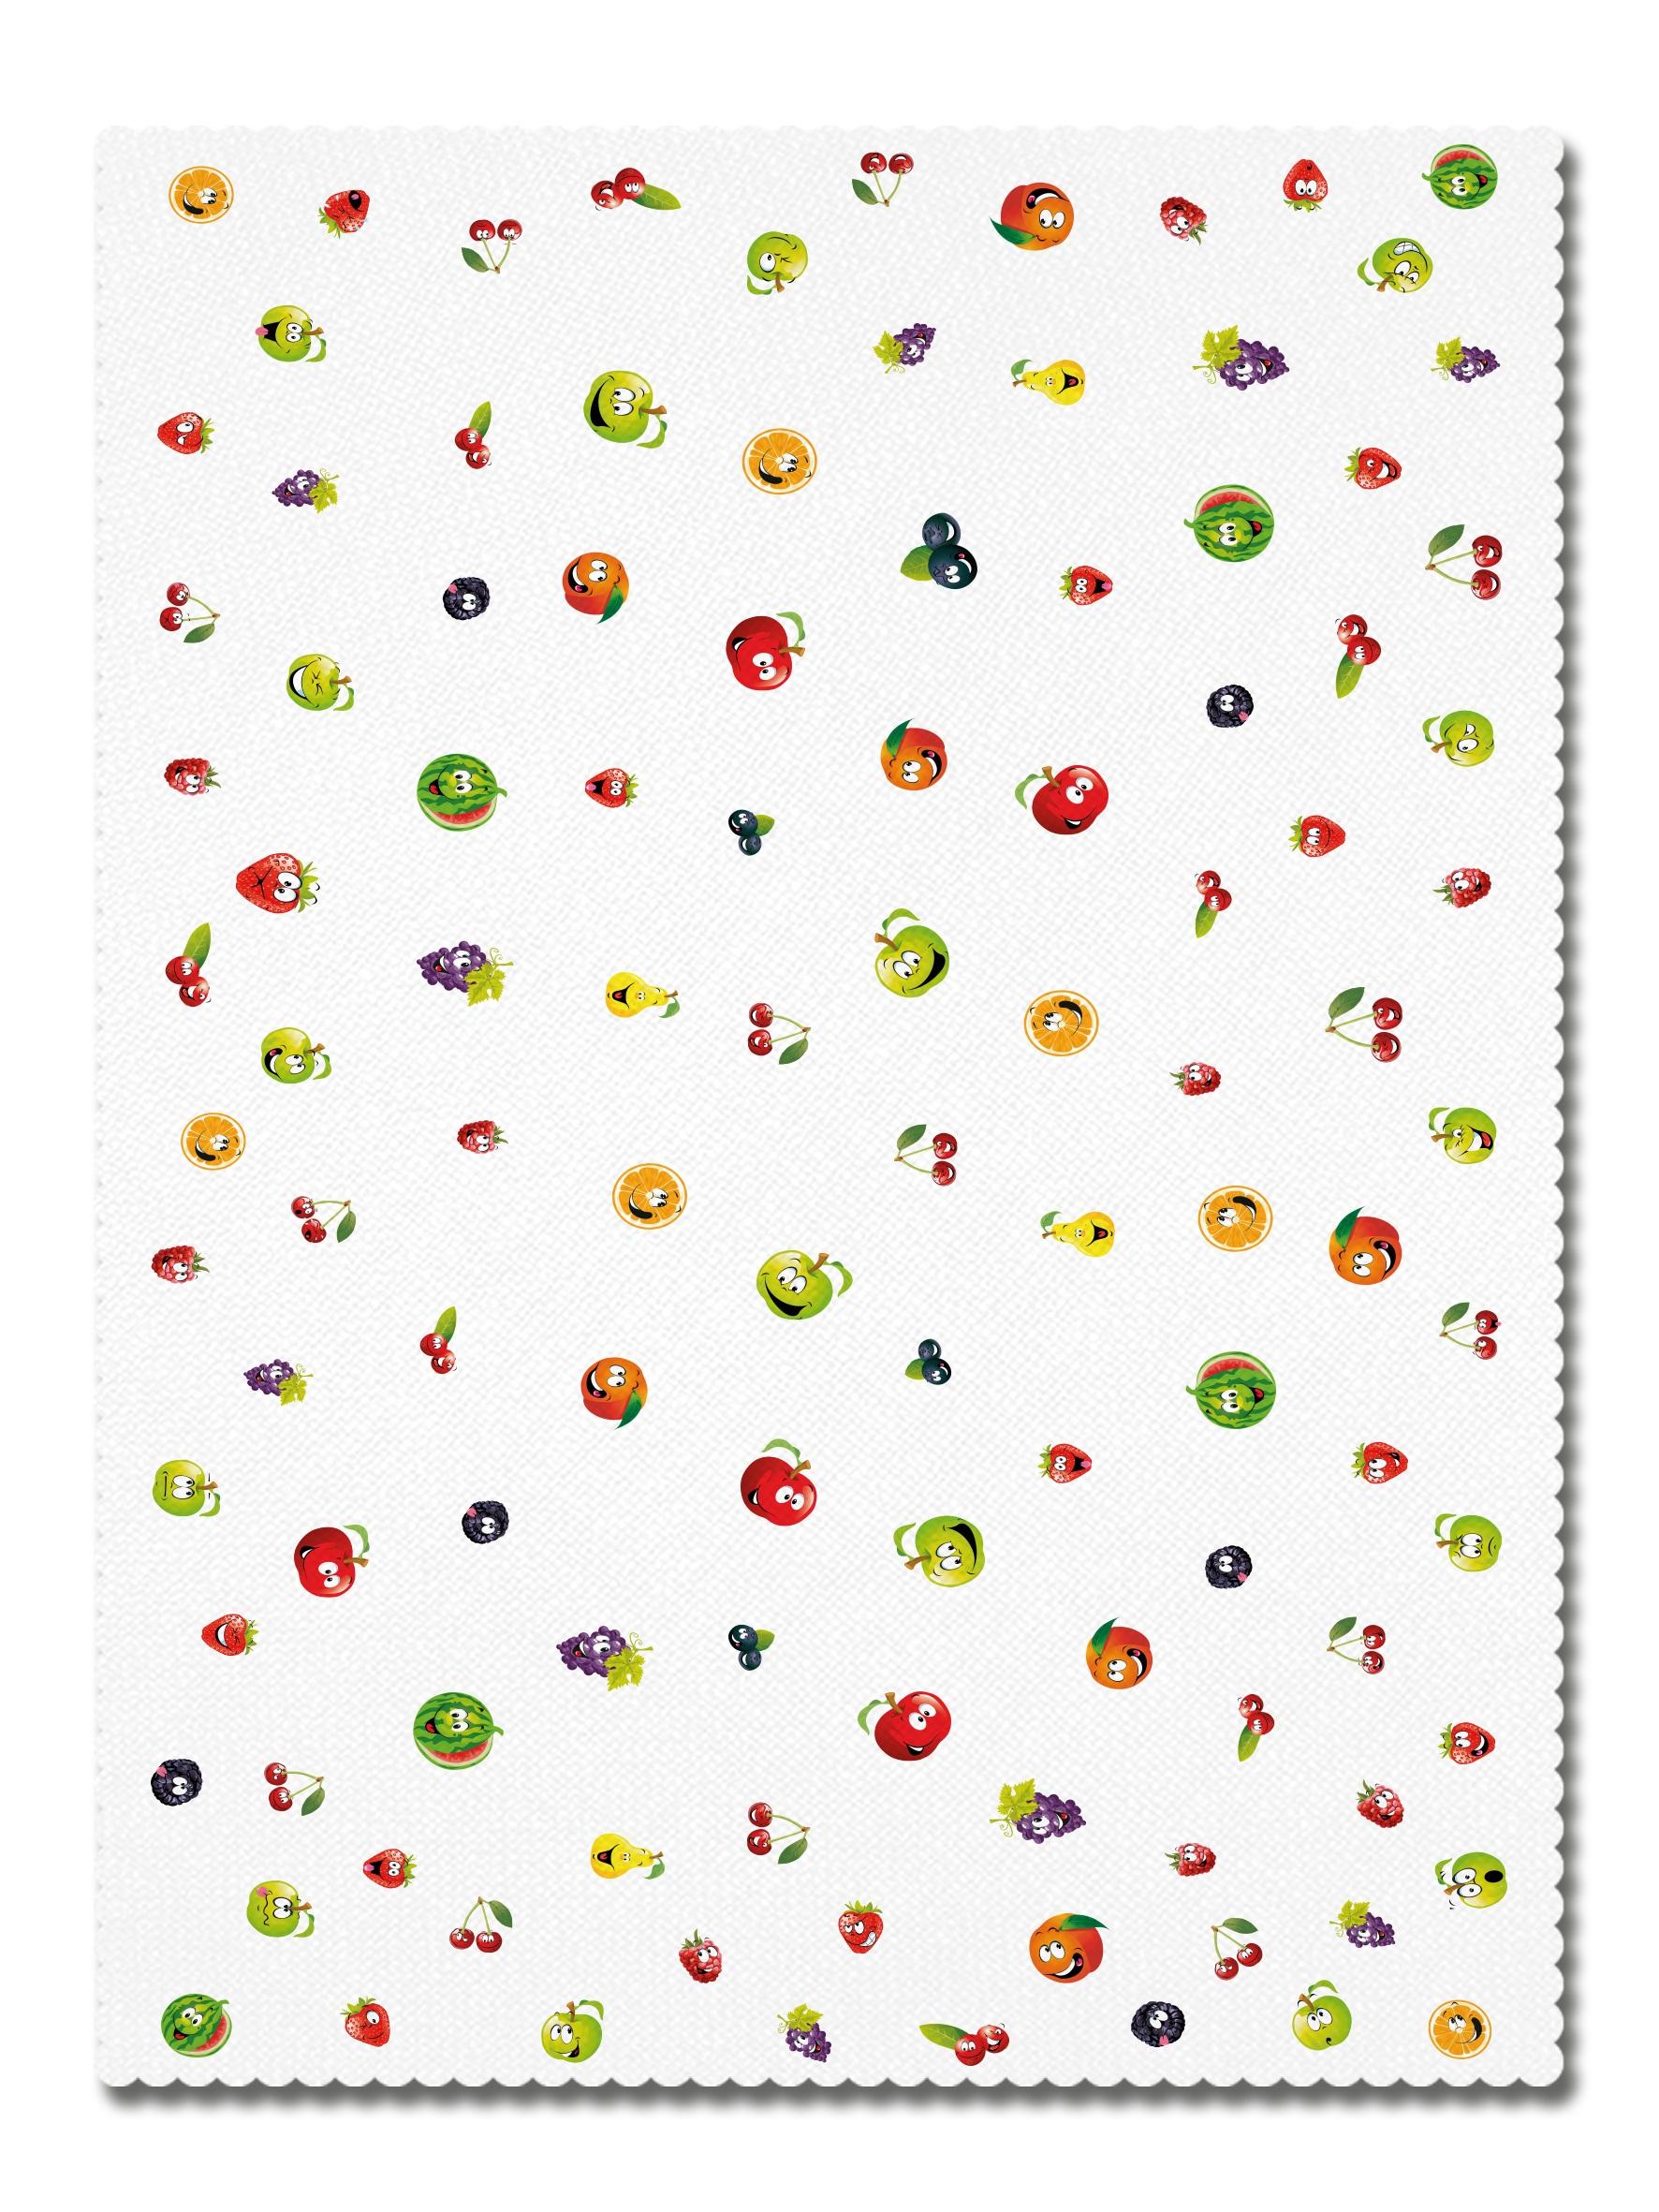 Pokrivka Fruits 3-0